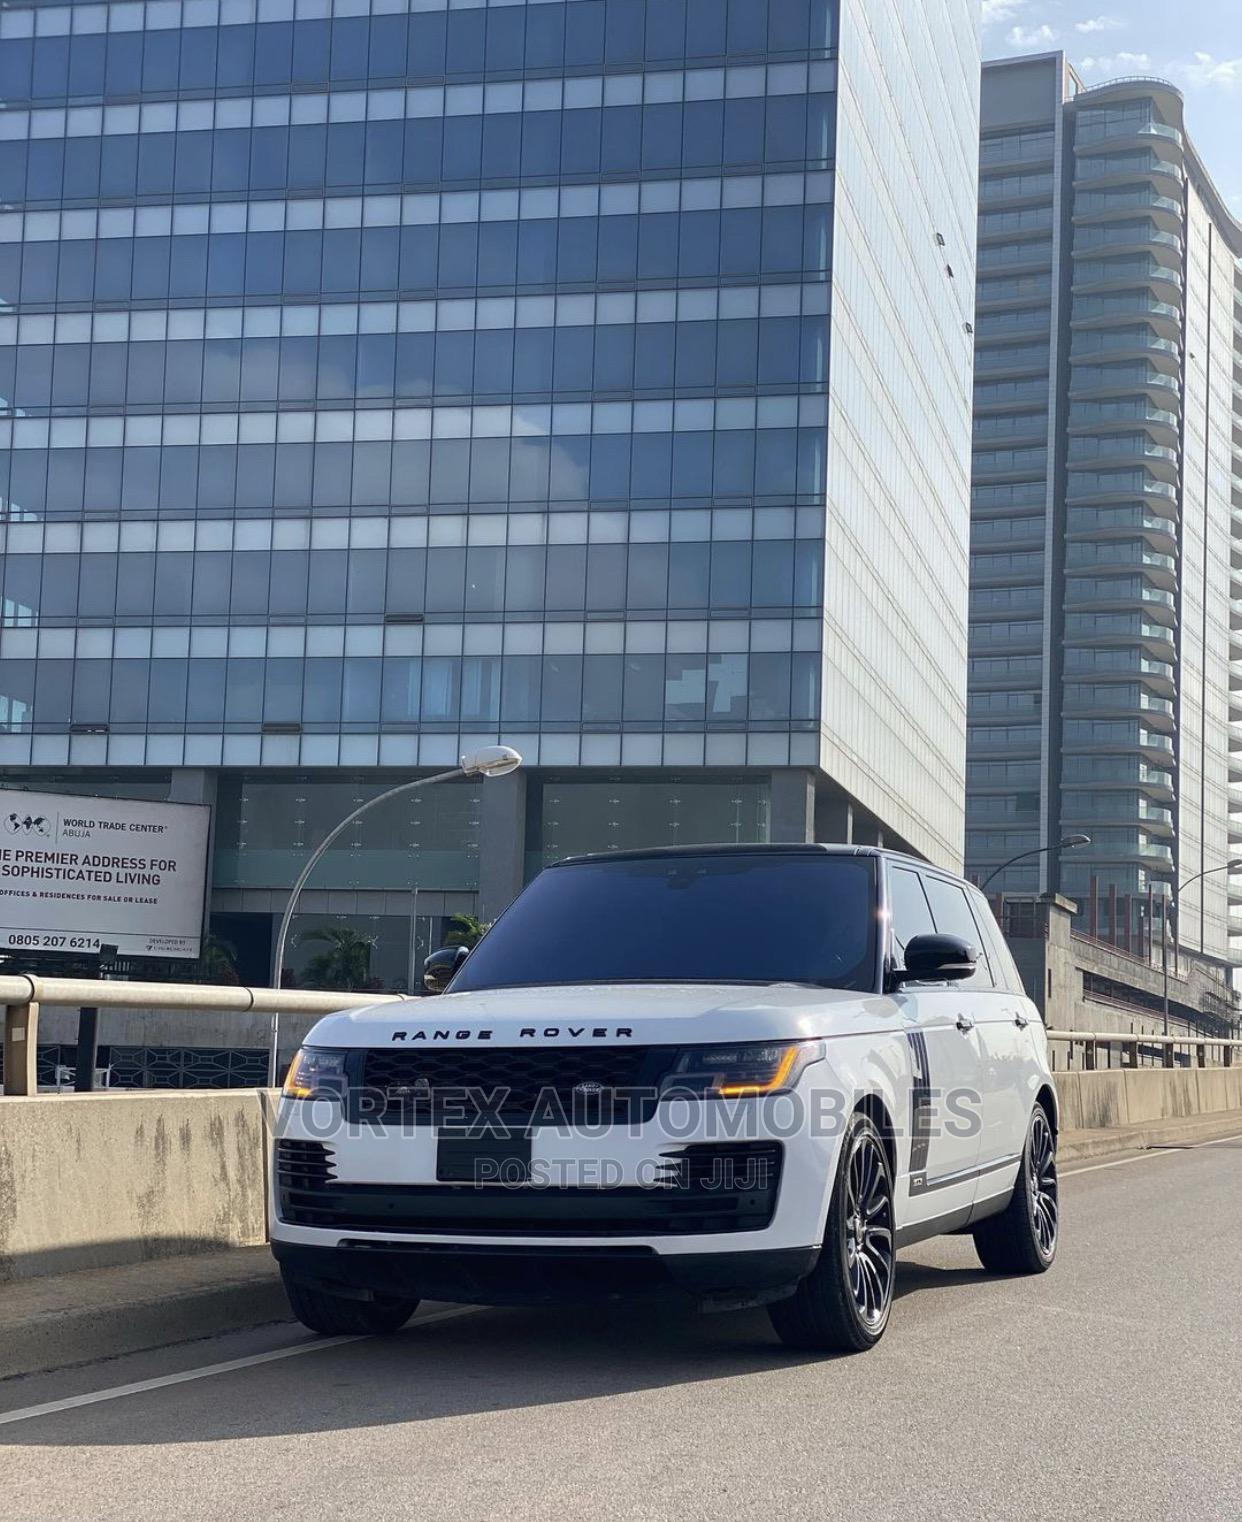 Land Rover Range Rover 2017 White | Cars for sale in Garki 2, Abuja (FCT) State, Nigeria